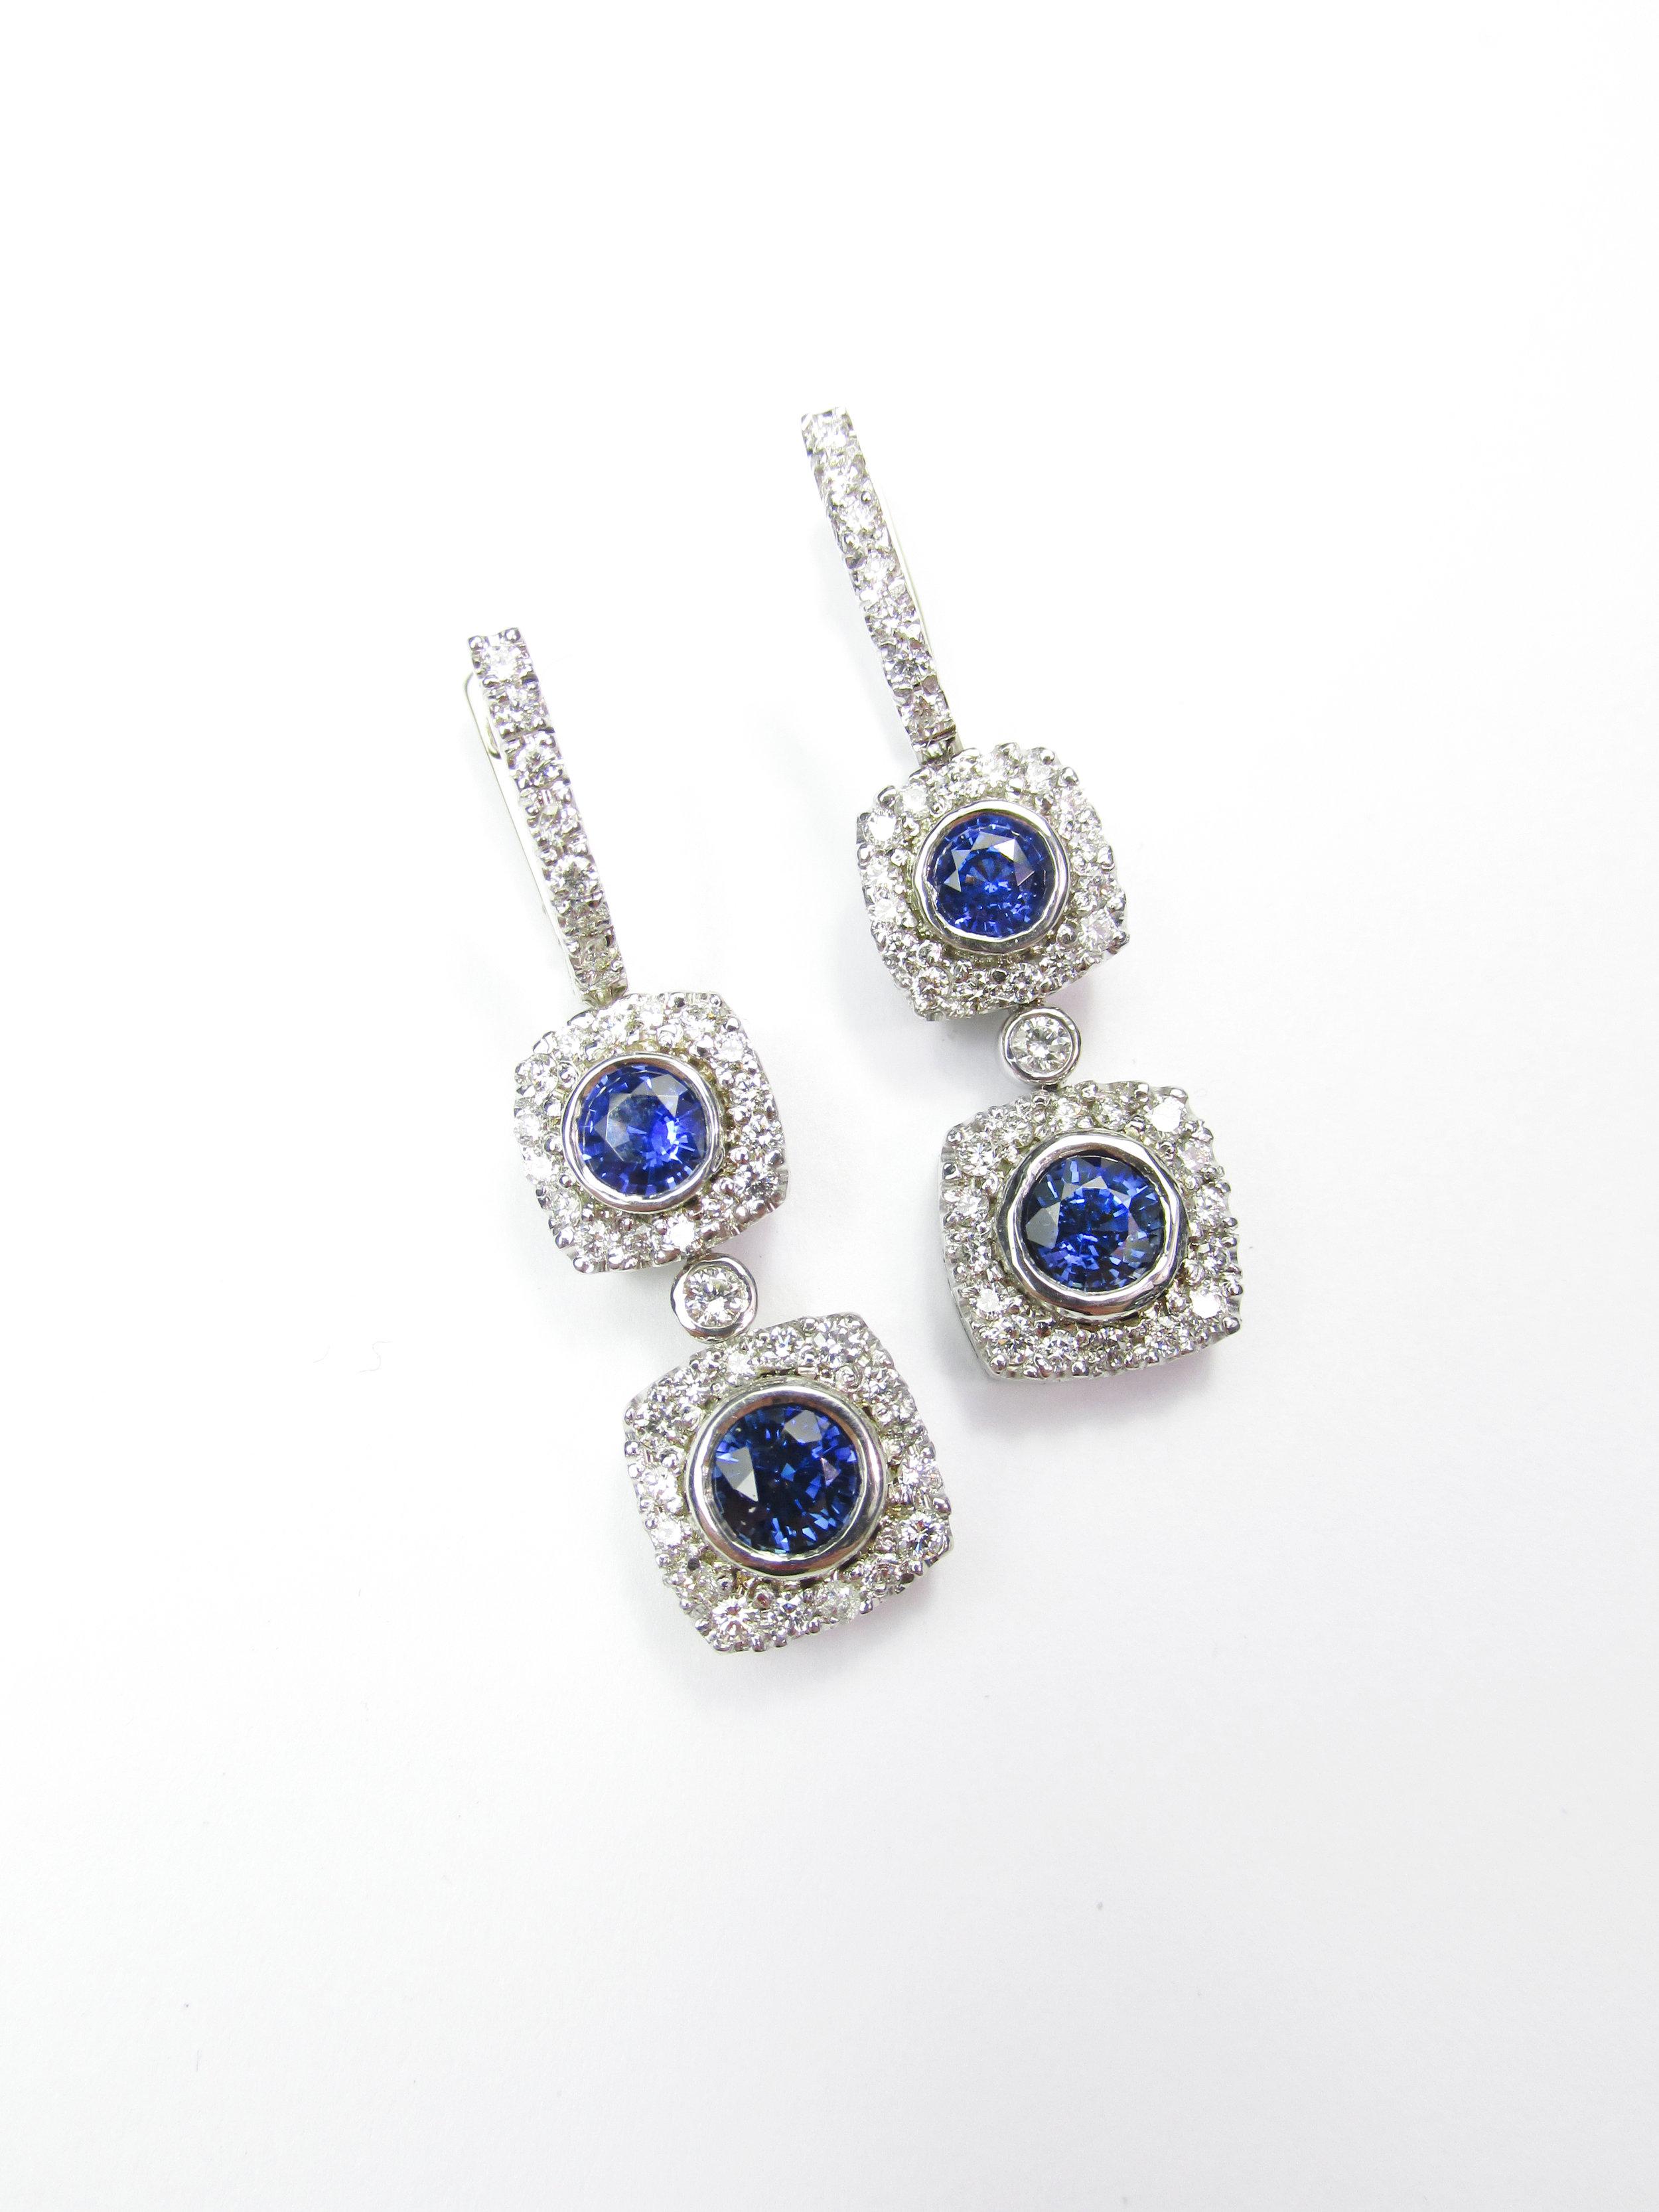 Sapphire & Diamond Dangles with Halos